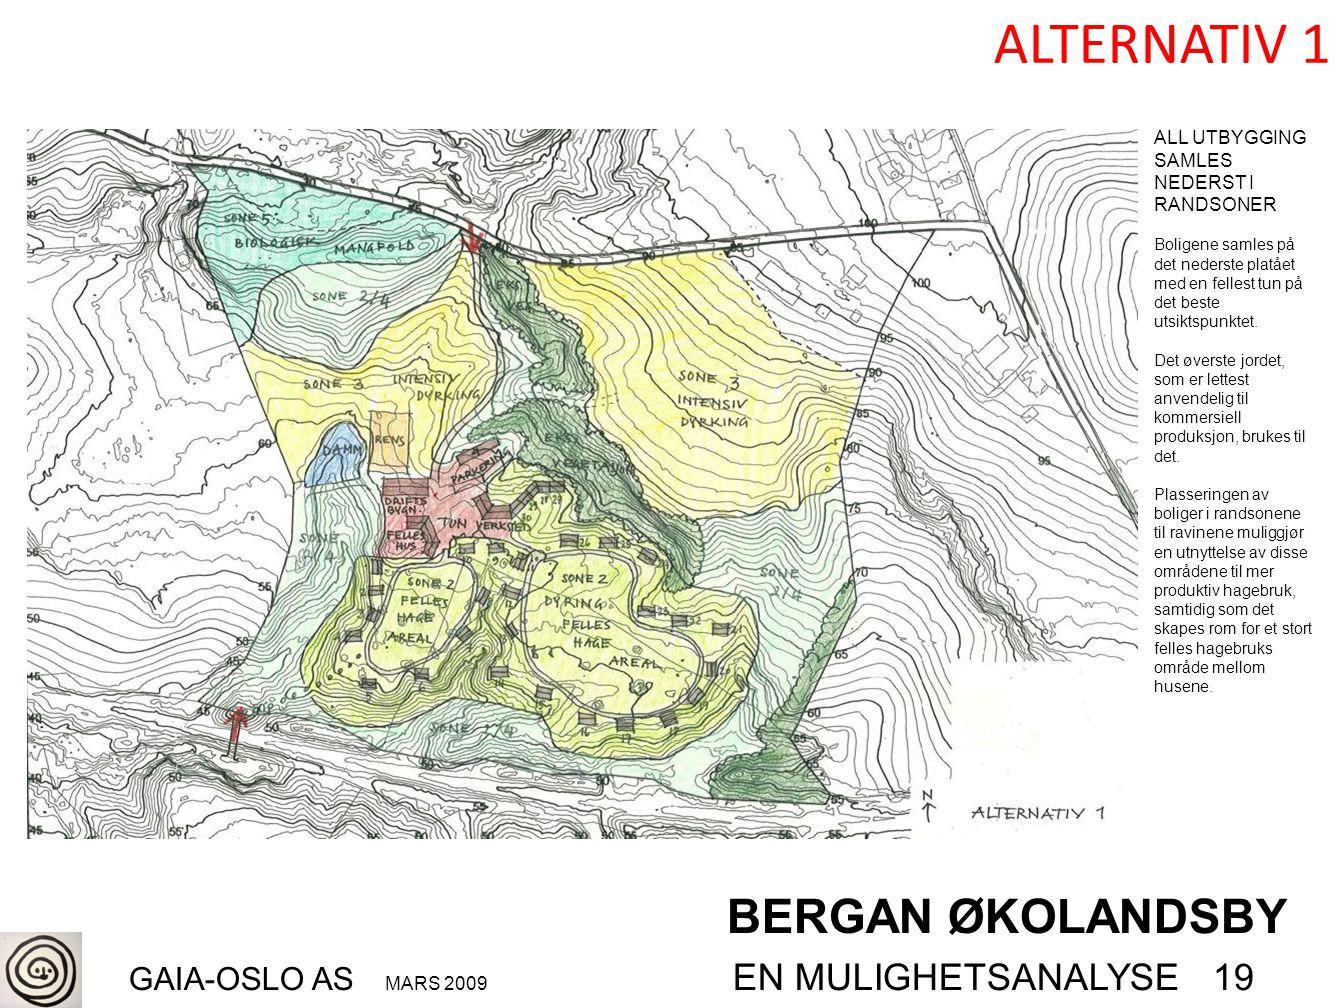 BERGAN ØKOLANDSBY GAIA-OSLO AS MARS 2009 EN MULIGHETSANALYSE 19